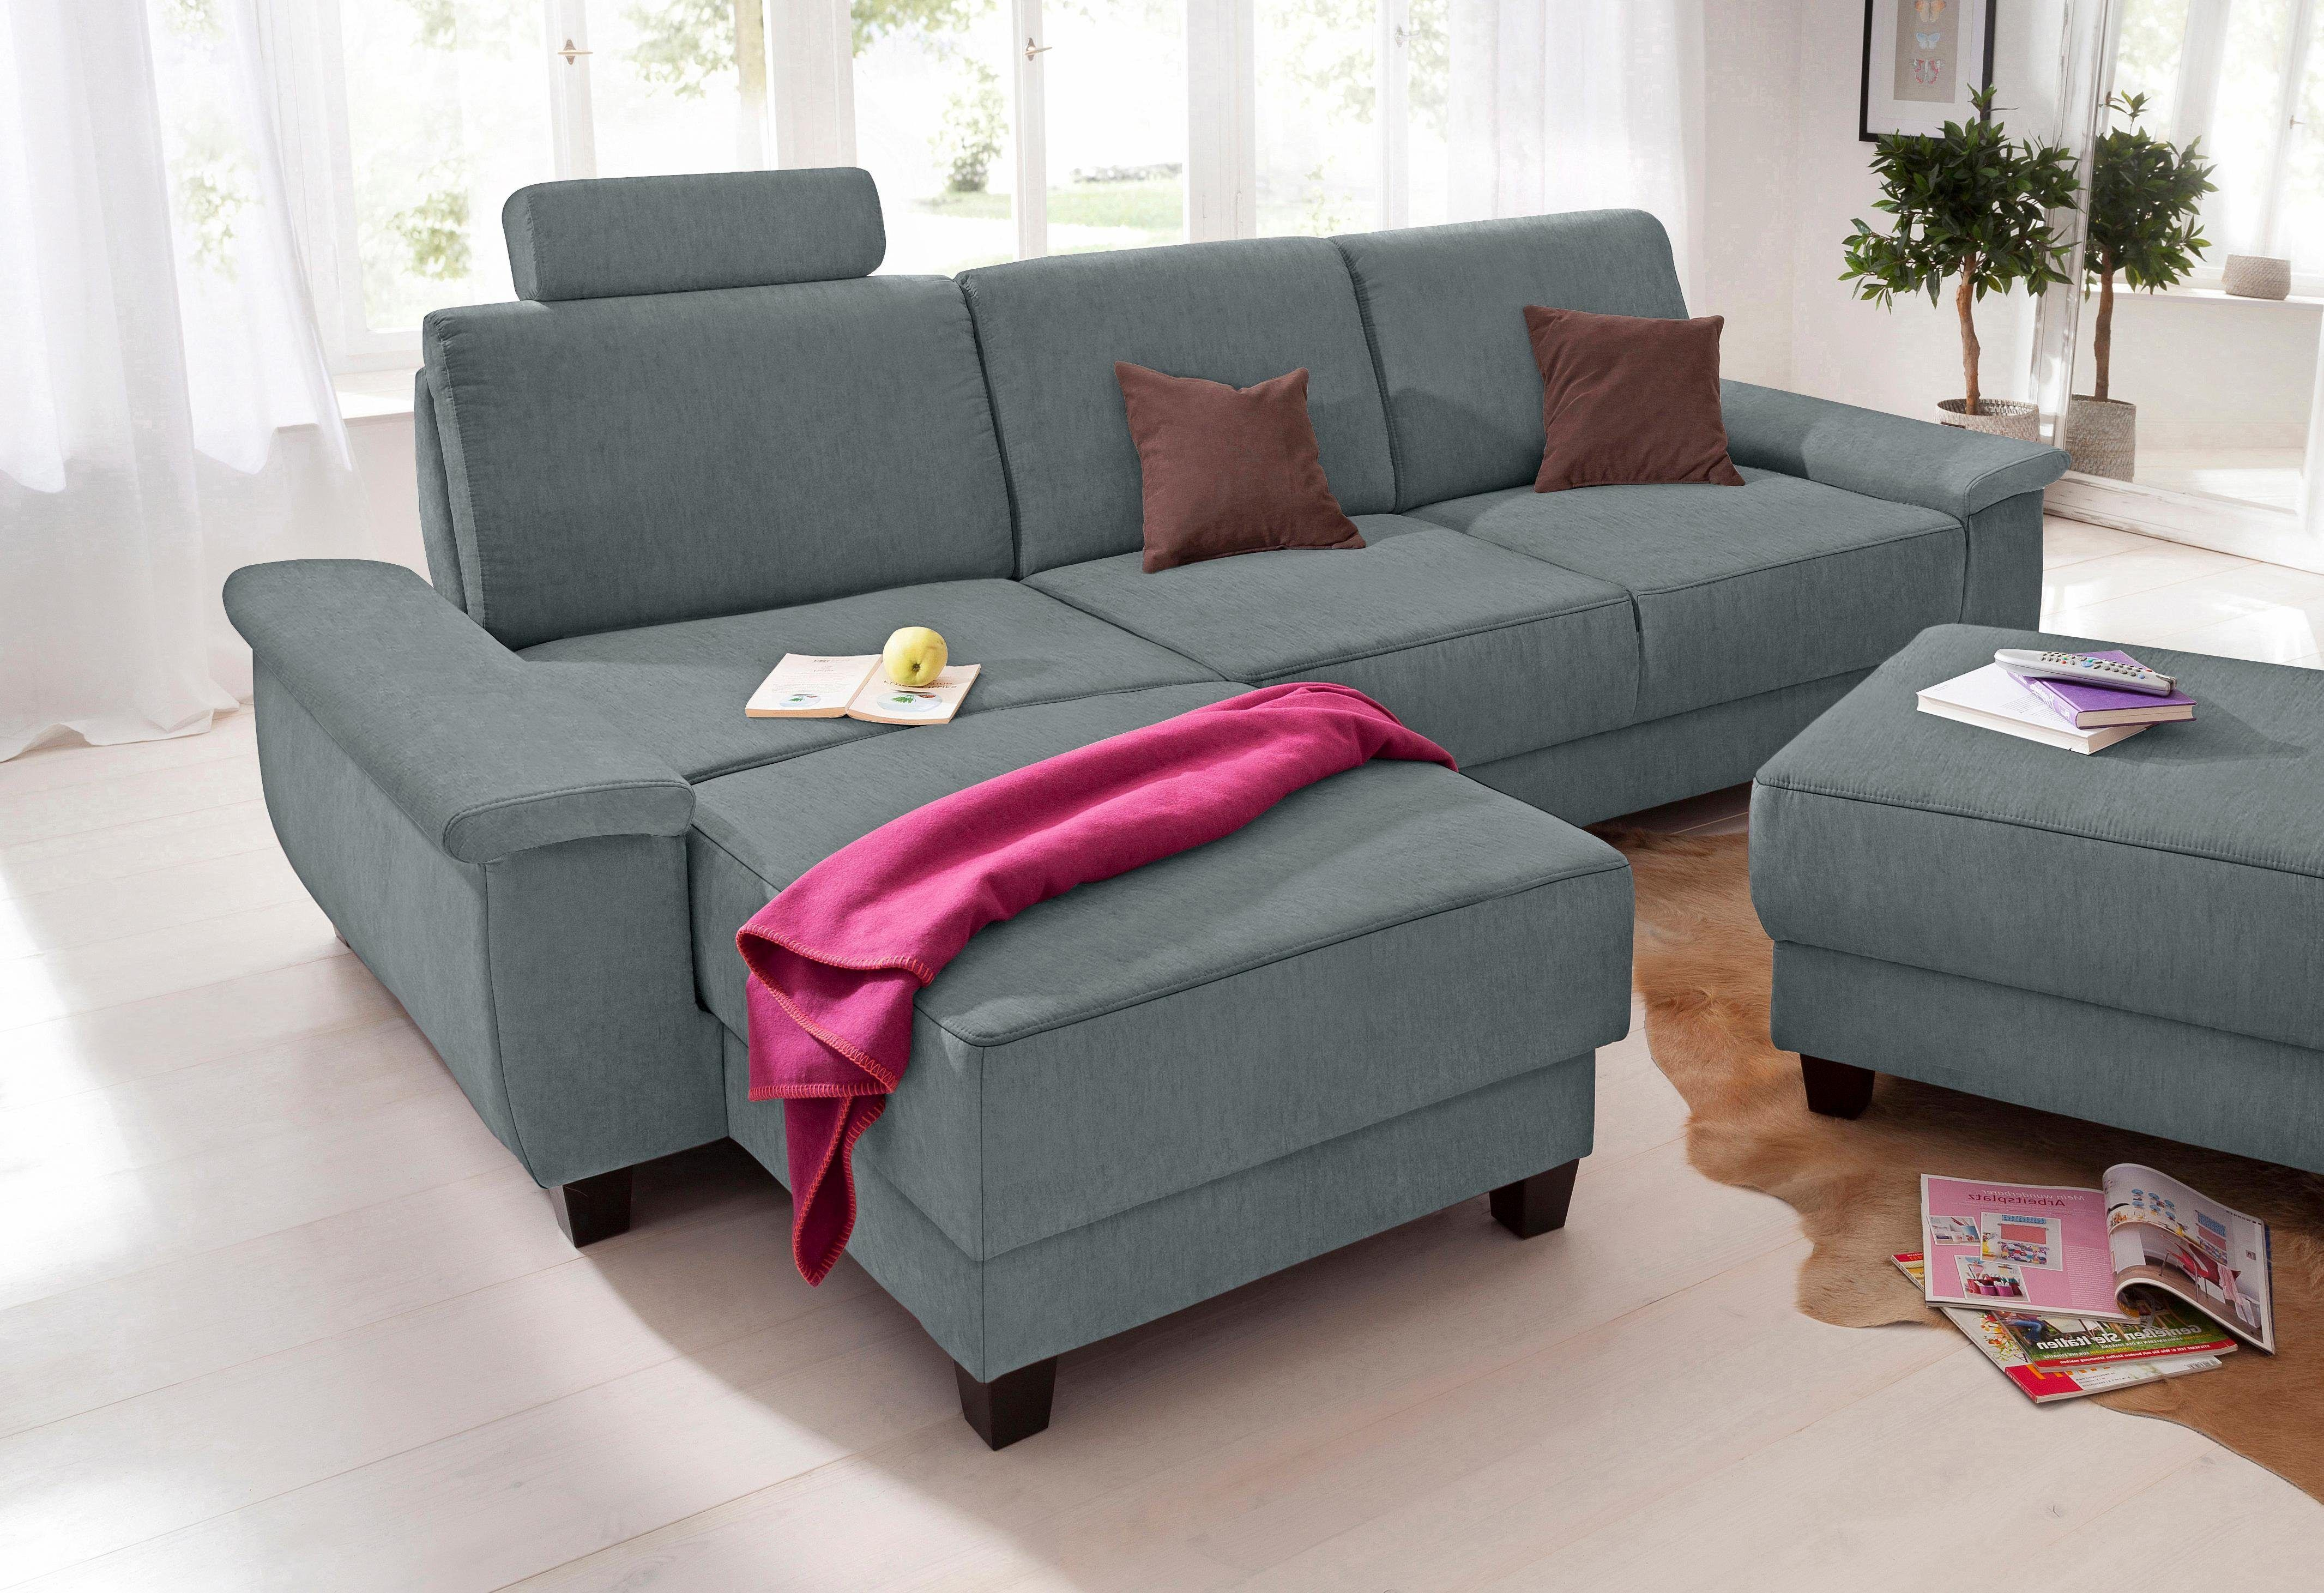 Astounding Sofa Mit Relaxfunktion Das Beste Von Home Affaire Ecksofa »mailand« Grau, Relaxfunktion, Recamiere